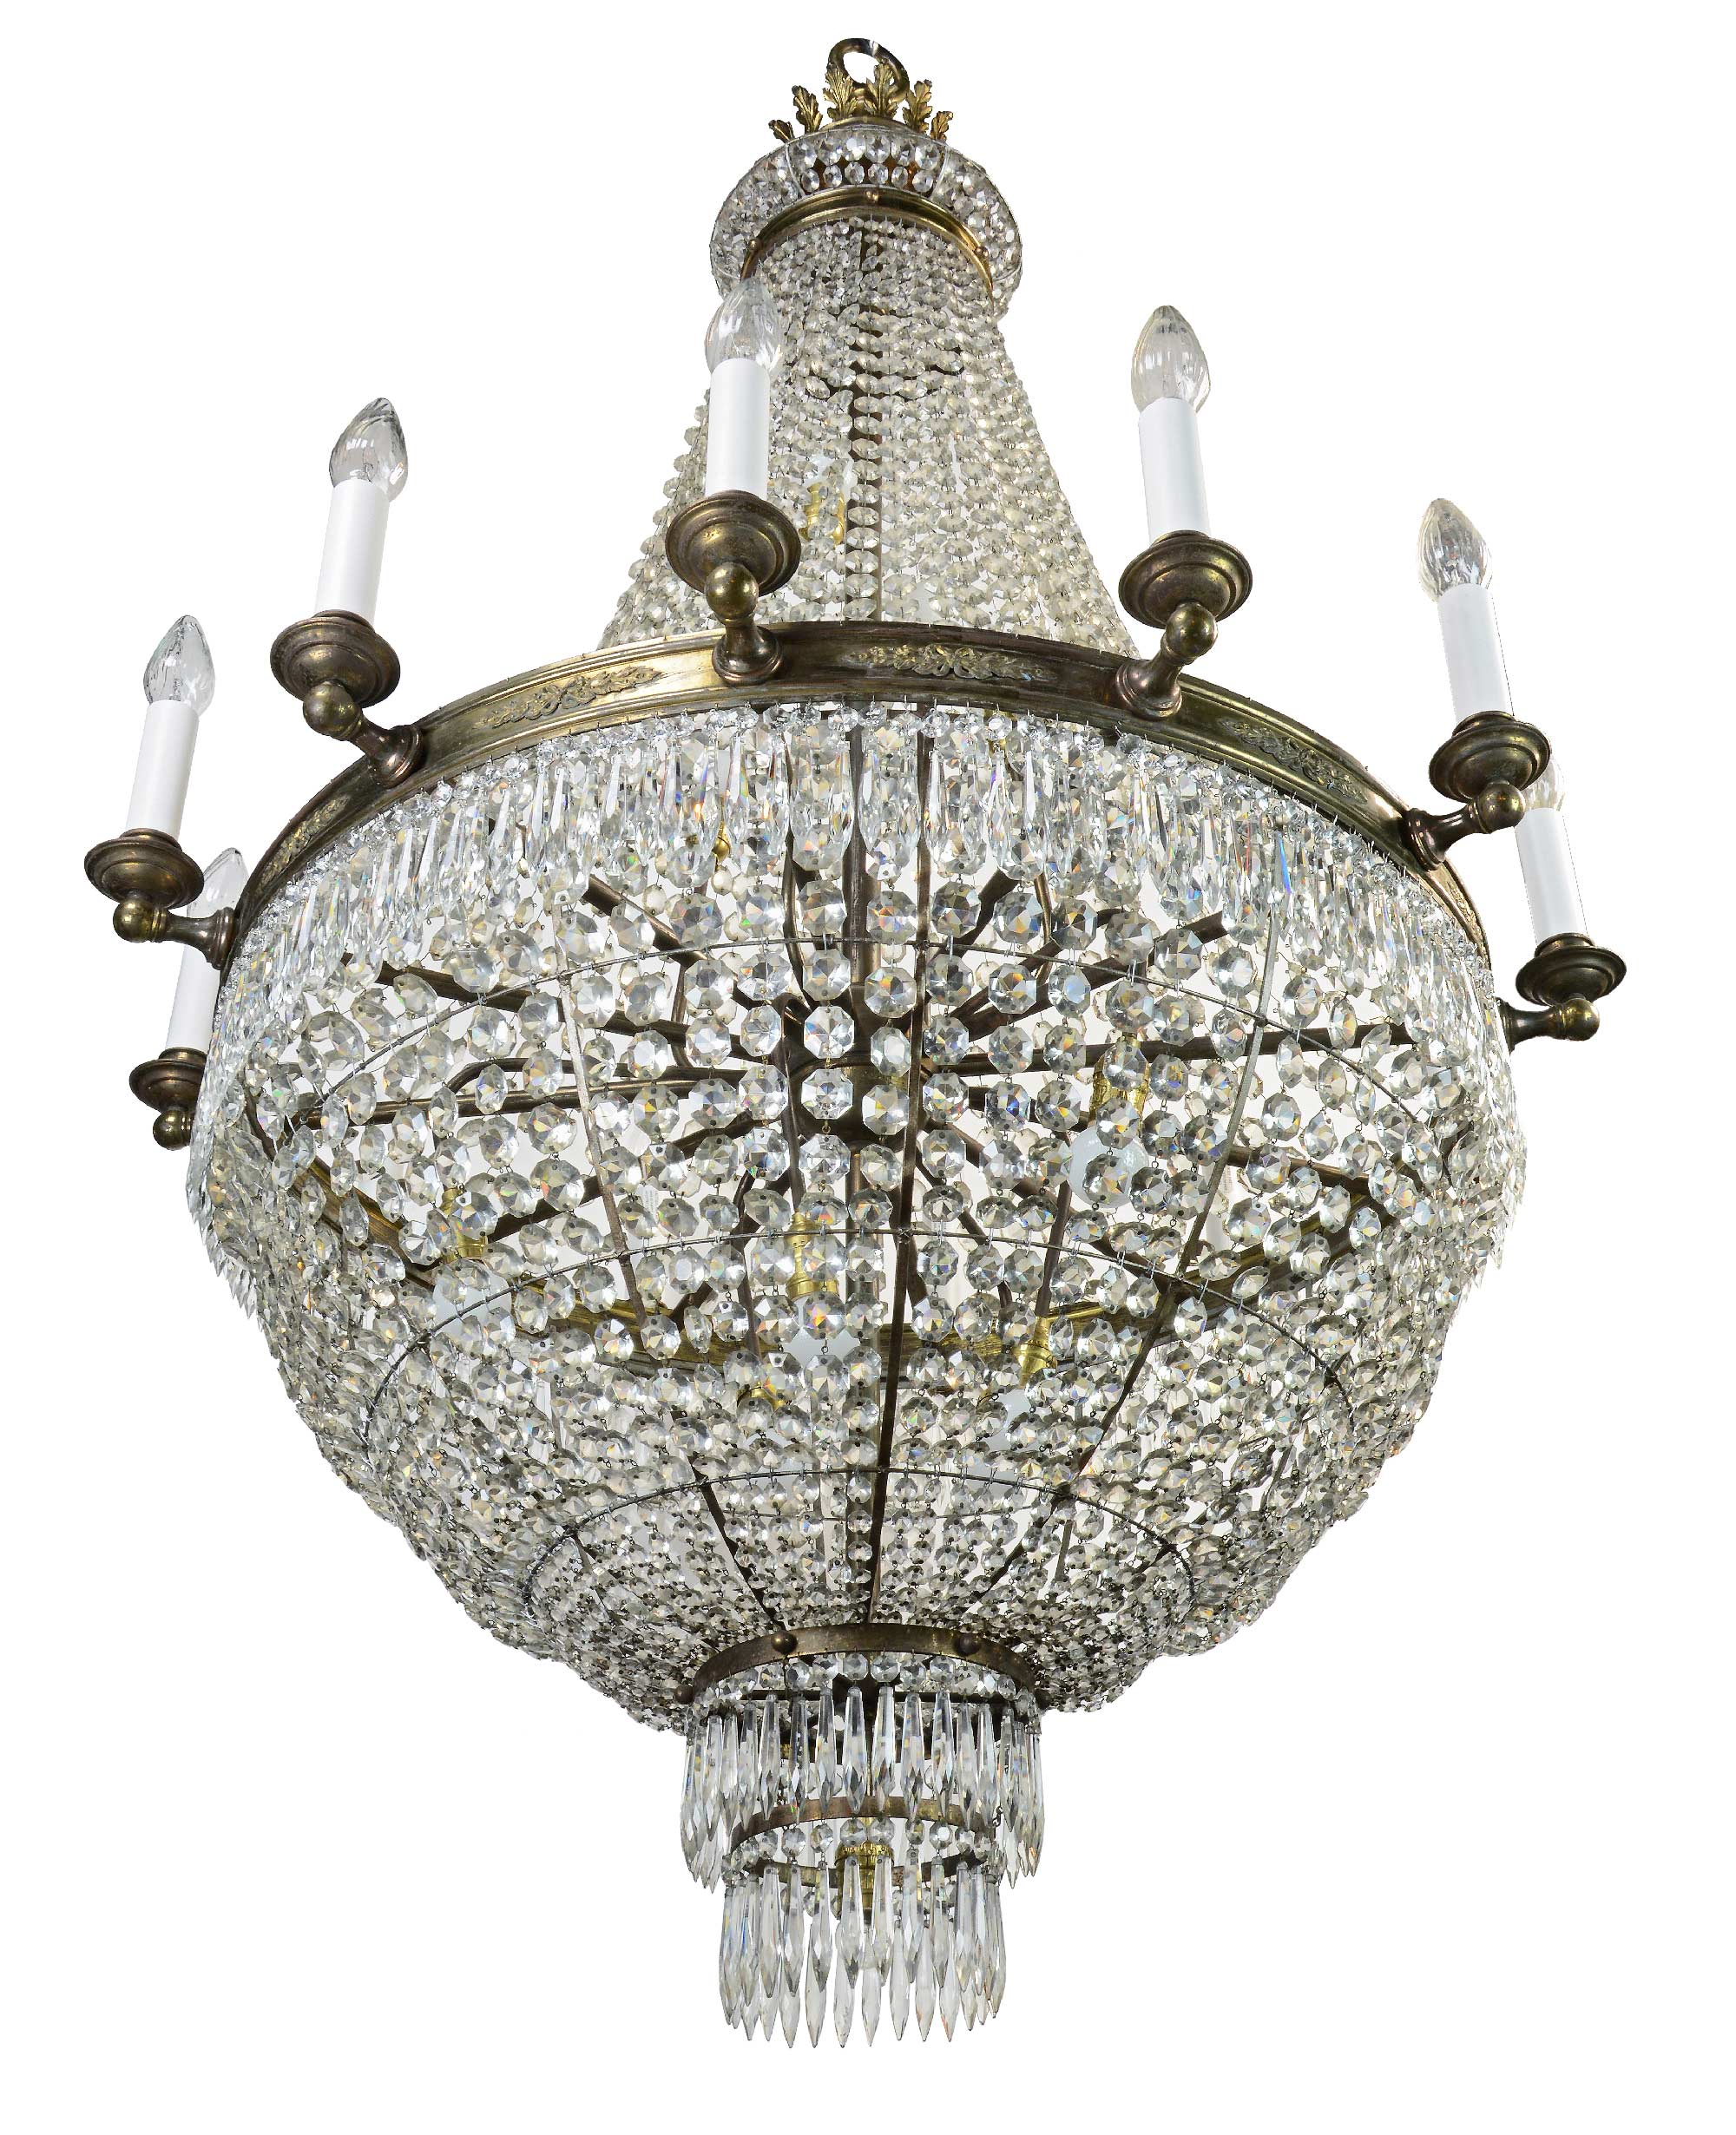 46798-crystal-chandelier-angle.jpg